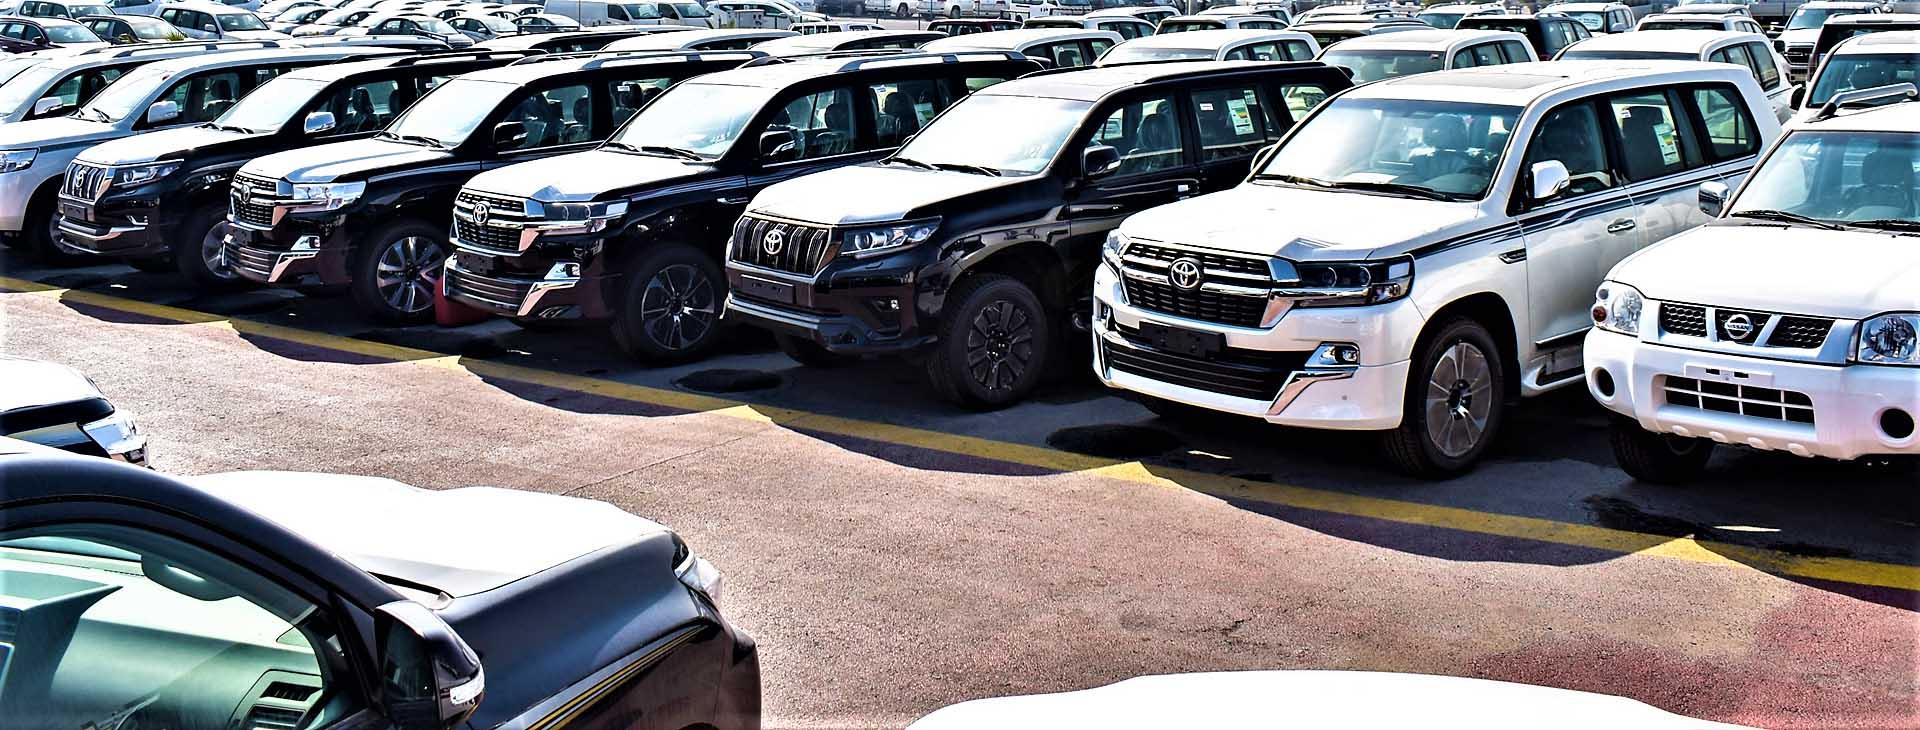 Vehicle Logistics Services